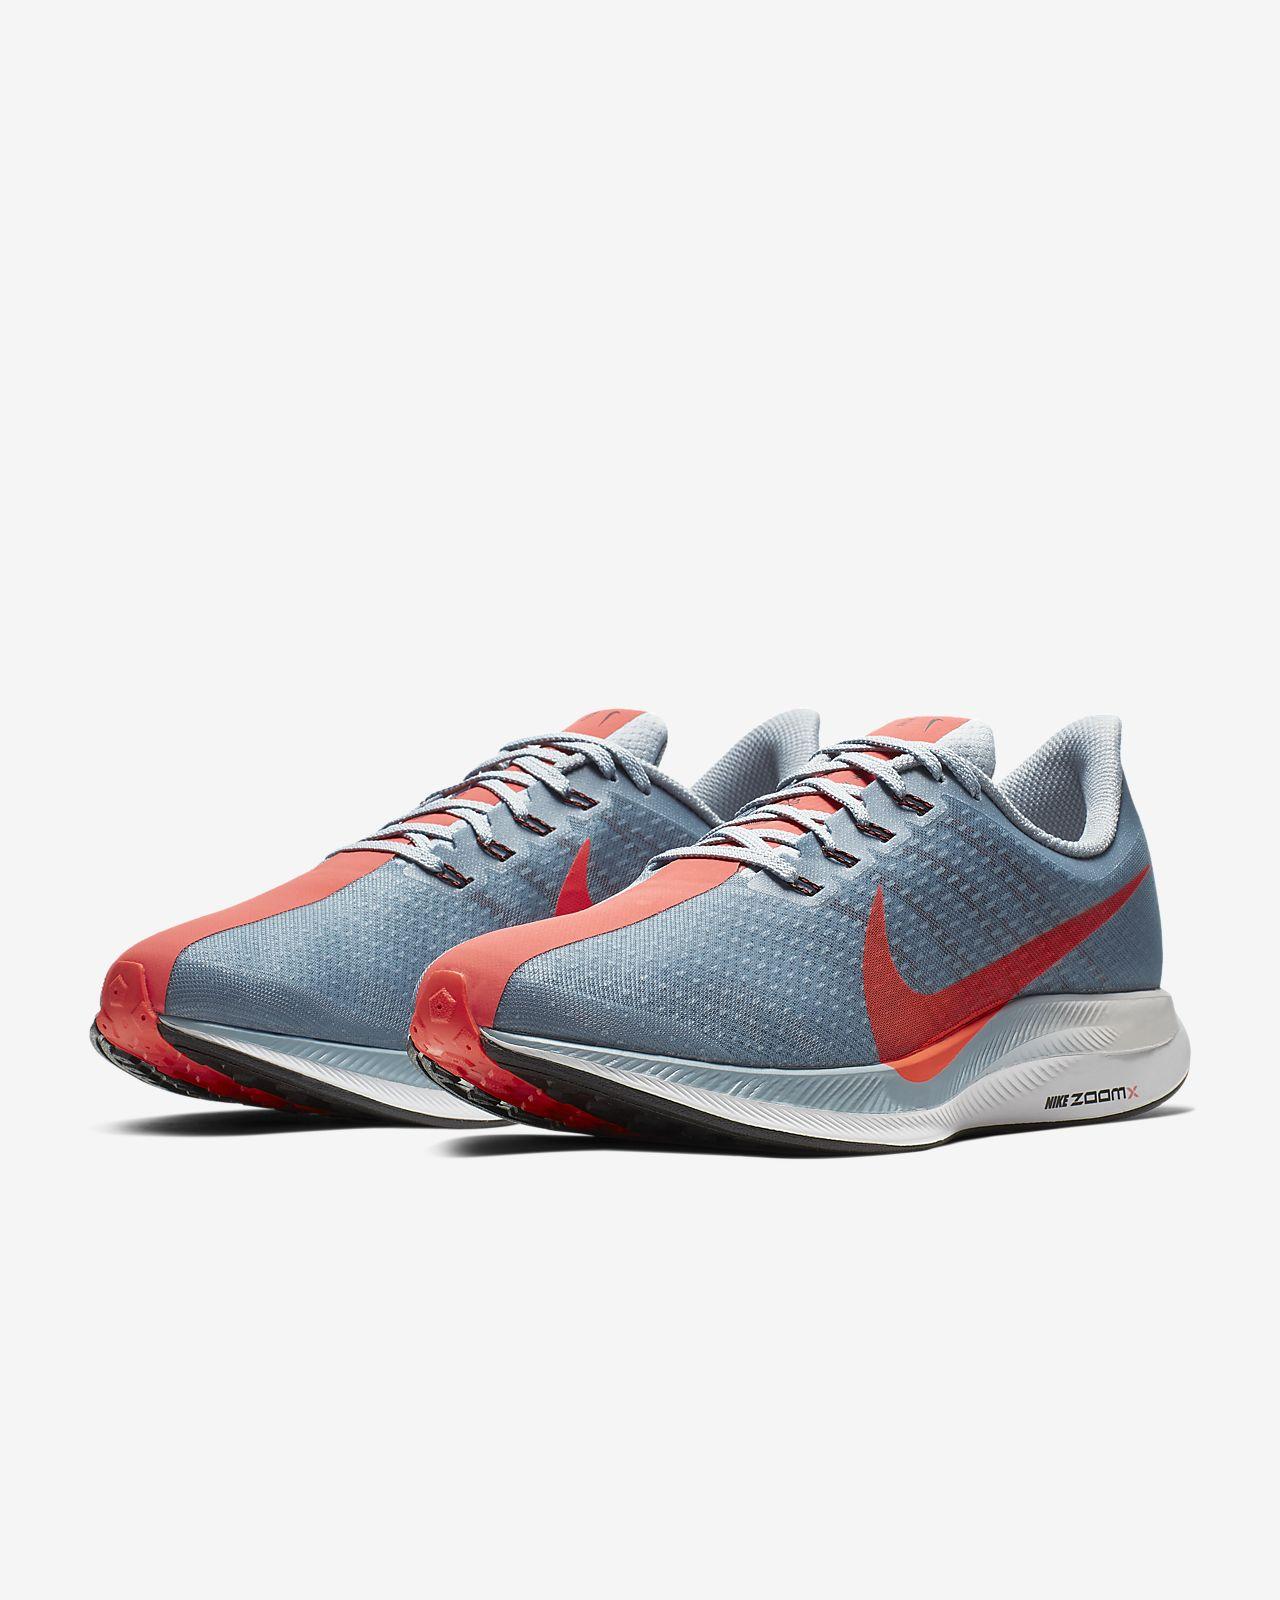 new style b0d67 32a58 ... Nike Zoom Pegasus Turbo Herren-Laufschuh